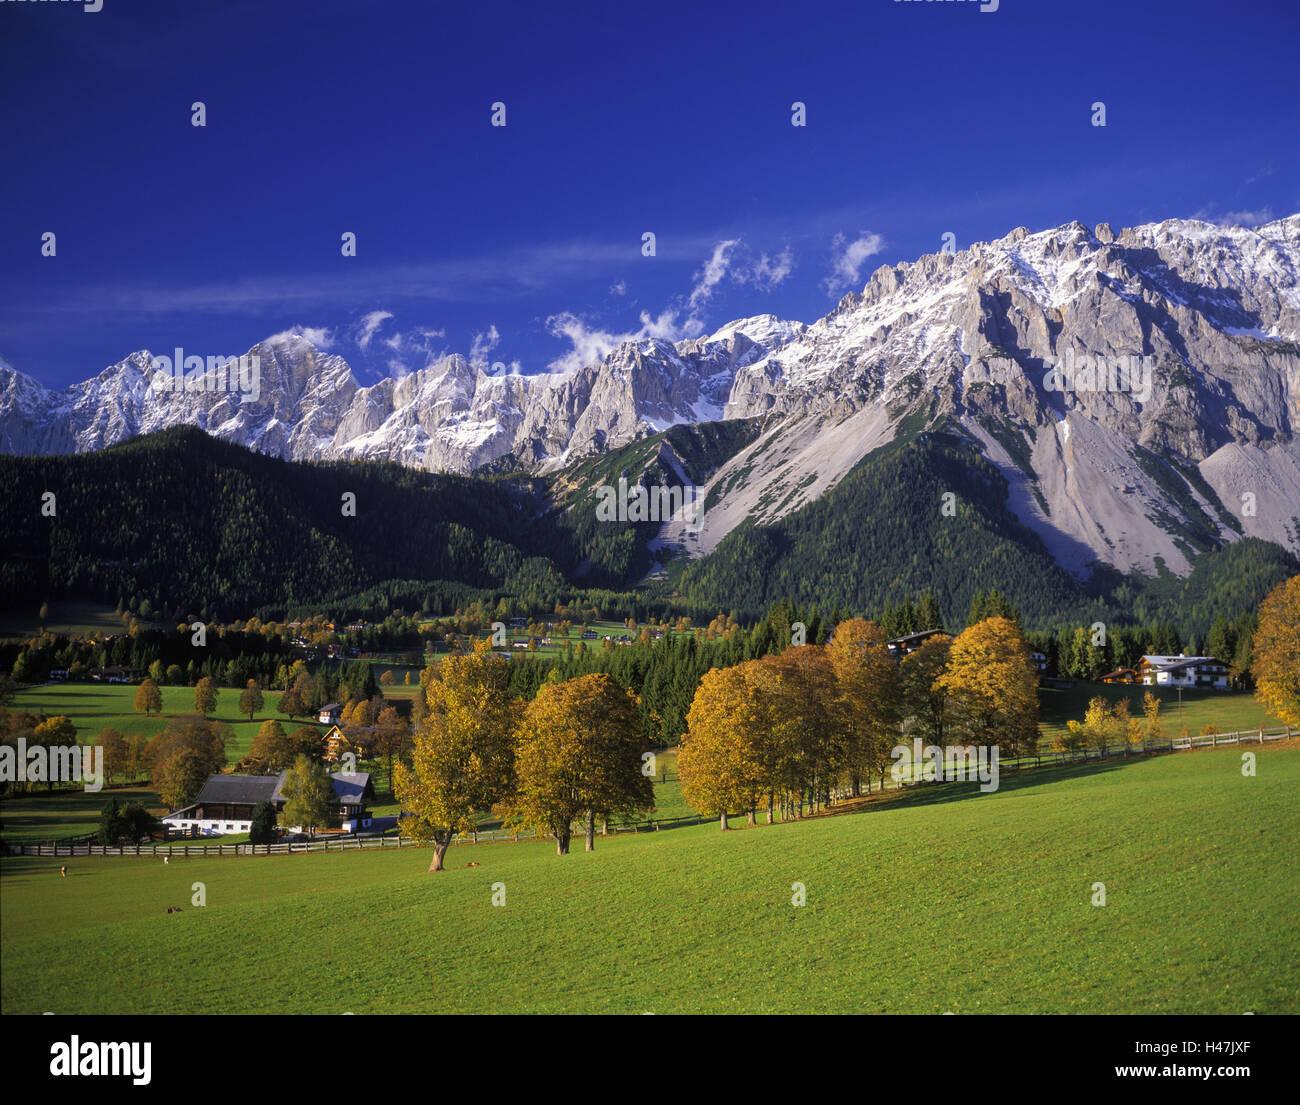 Austria, Styria, Dachsteingebirge, Ramsau, autumn scenery, background roof stone group, view with premountain, Stock Photo